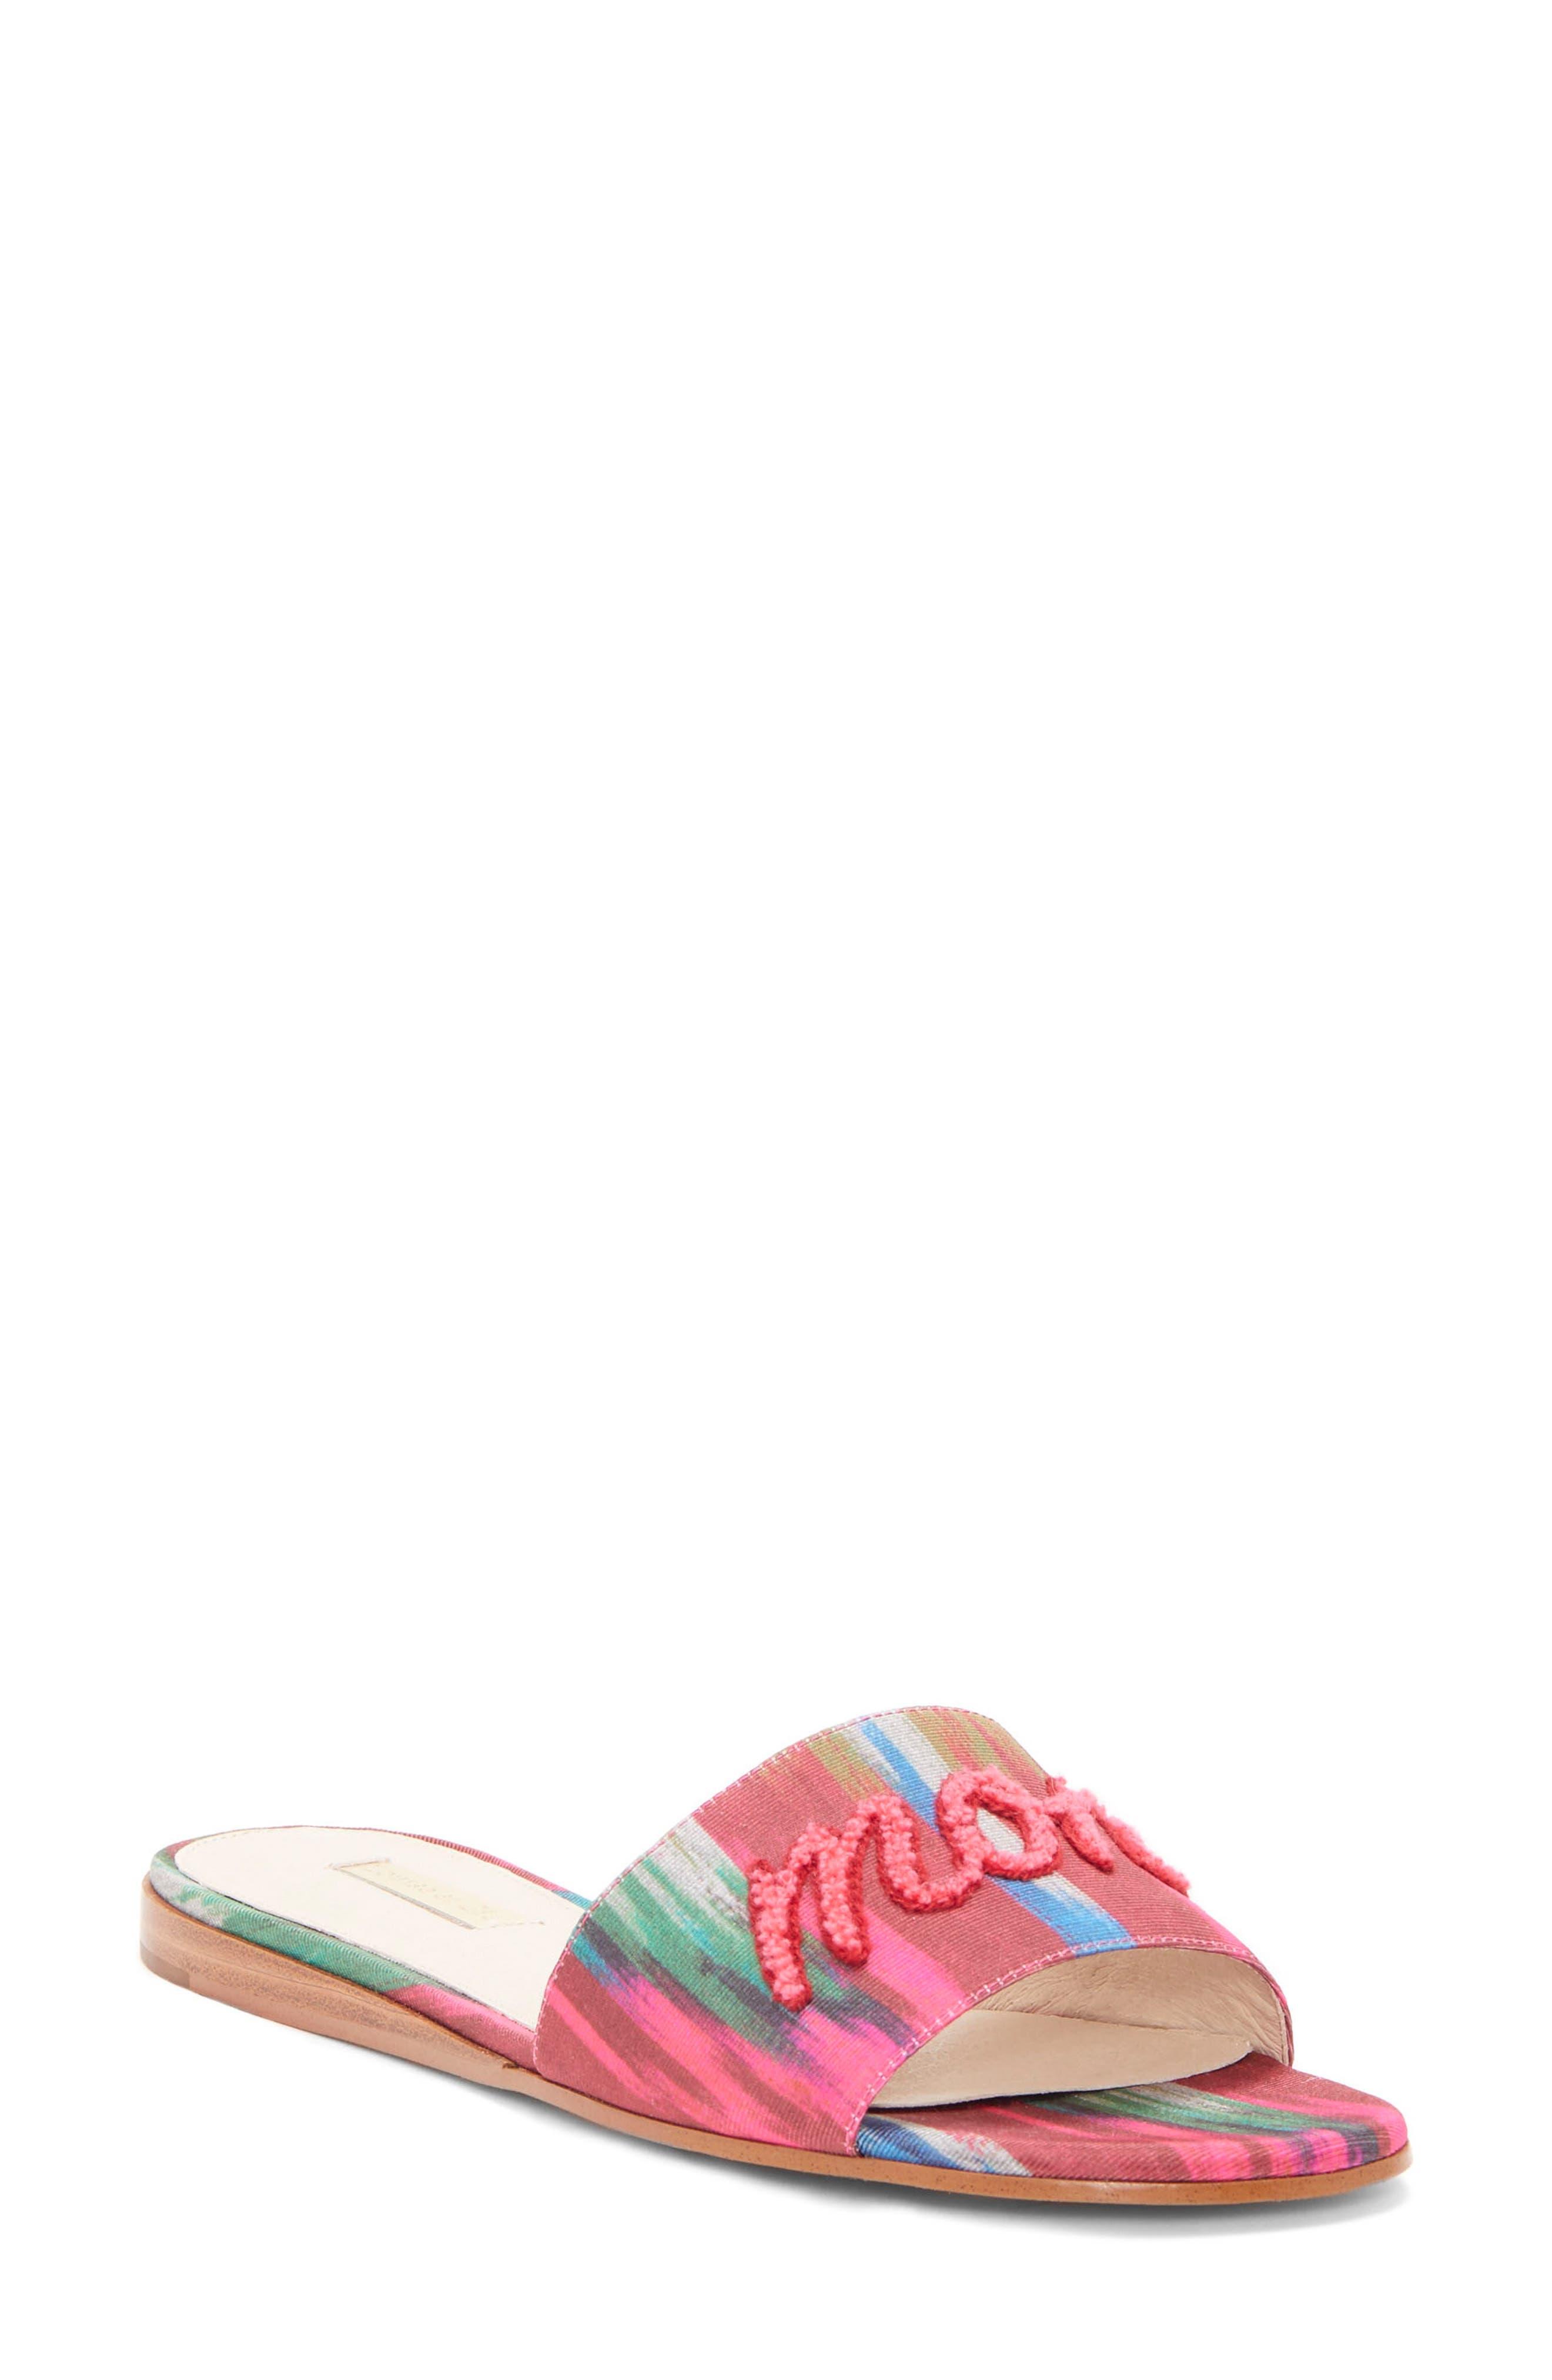 Louise Et Cie Anneta Slide Sandal- Pink